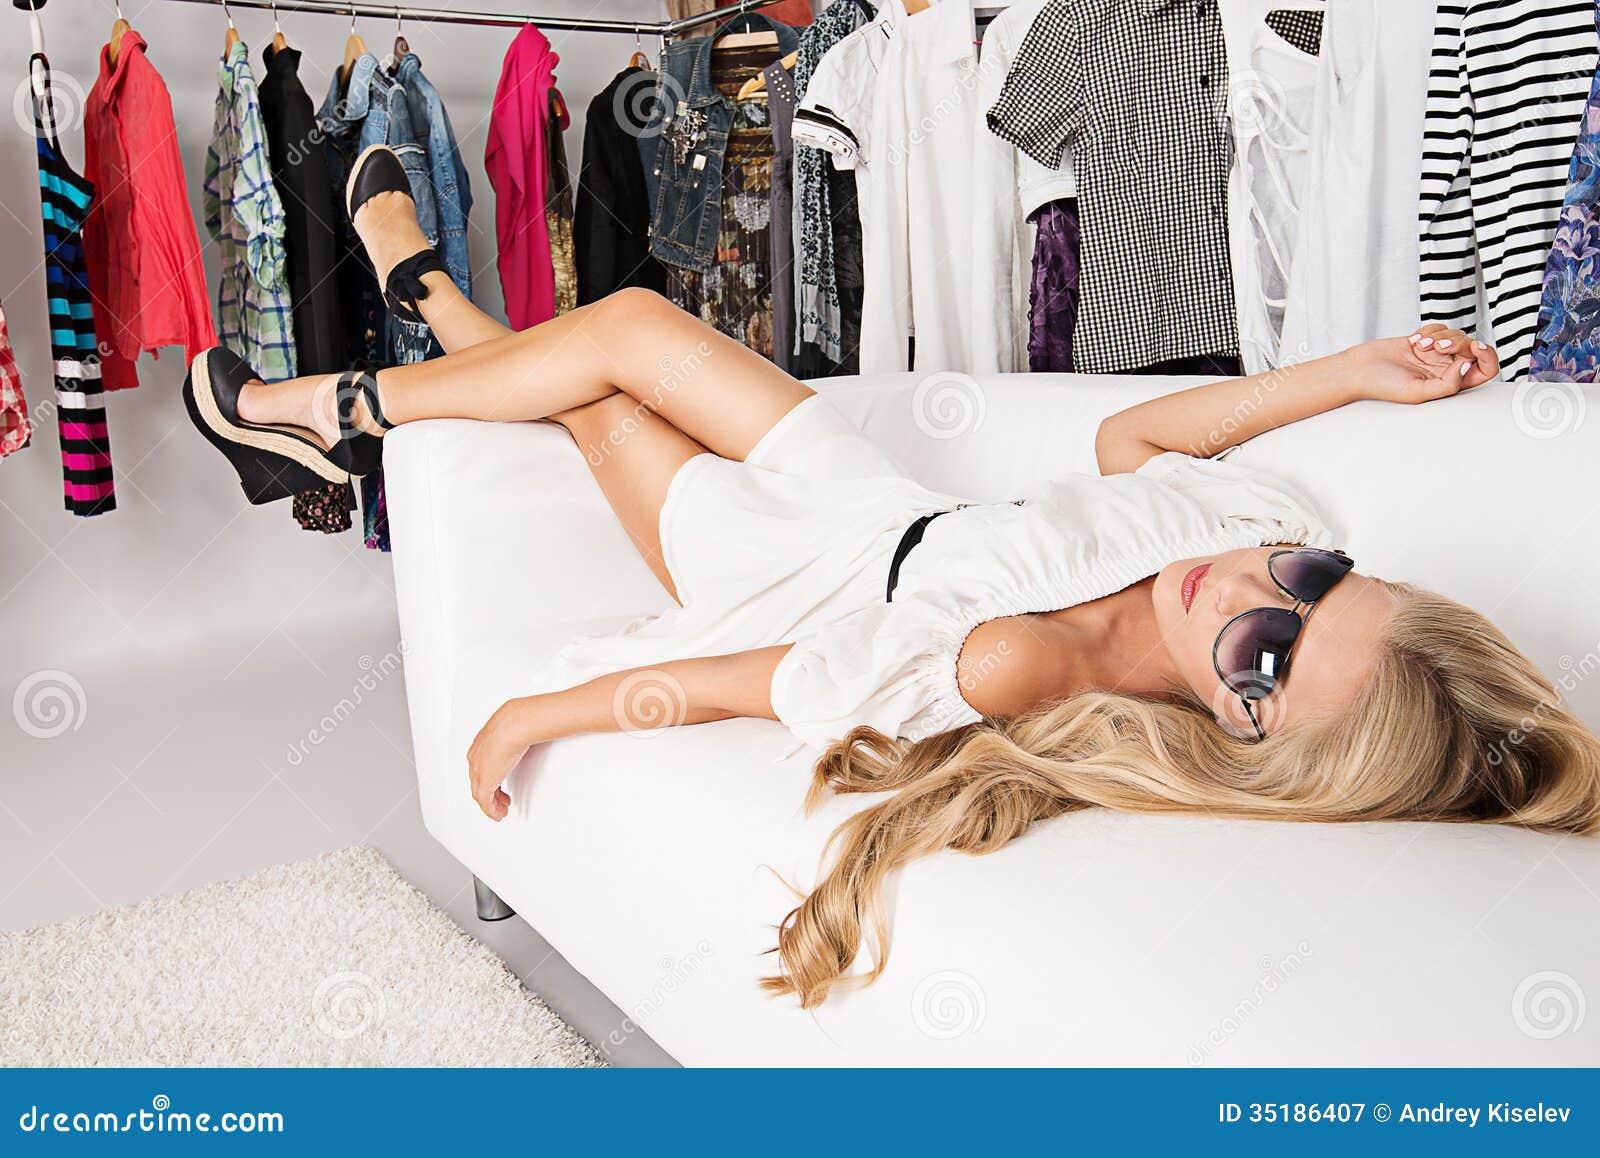 Women clothing stores. Paradise clothing store